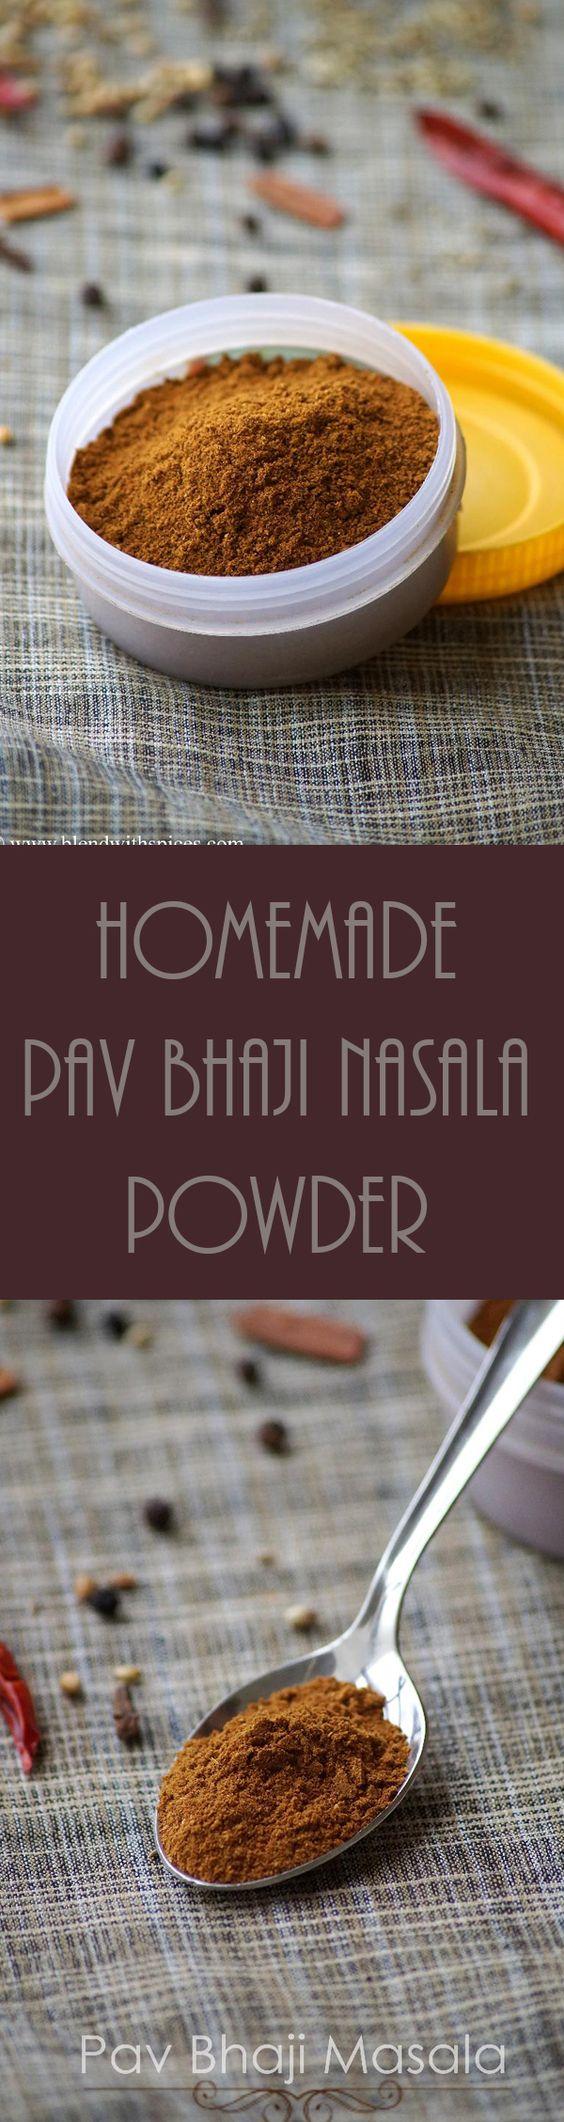 How to make Pav Bhaji Masala Powder at home - Homemade spice blend for pav bhaji, masala pav and tawa pulao. Step by step recipe. blendwithspices.com